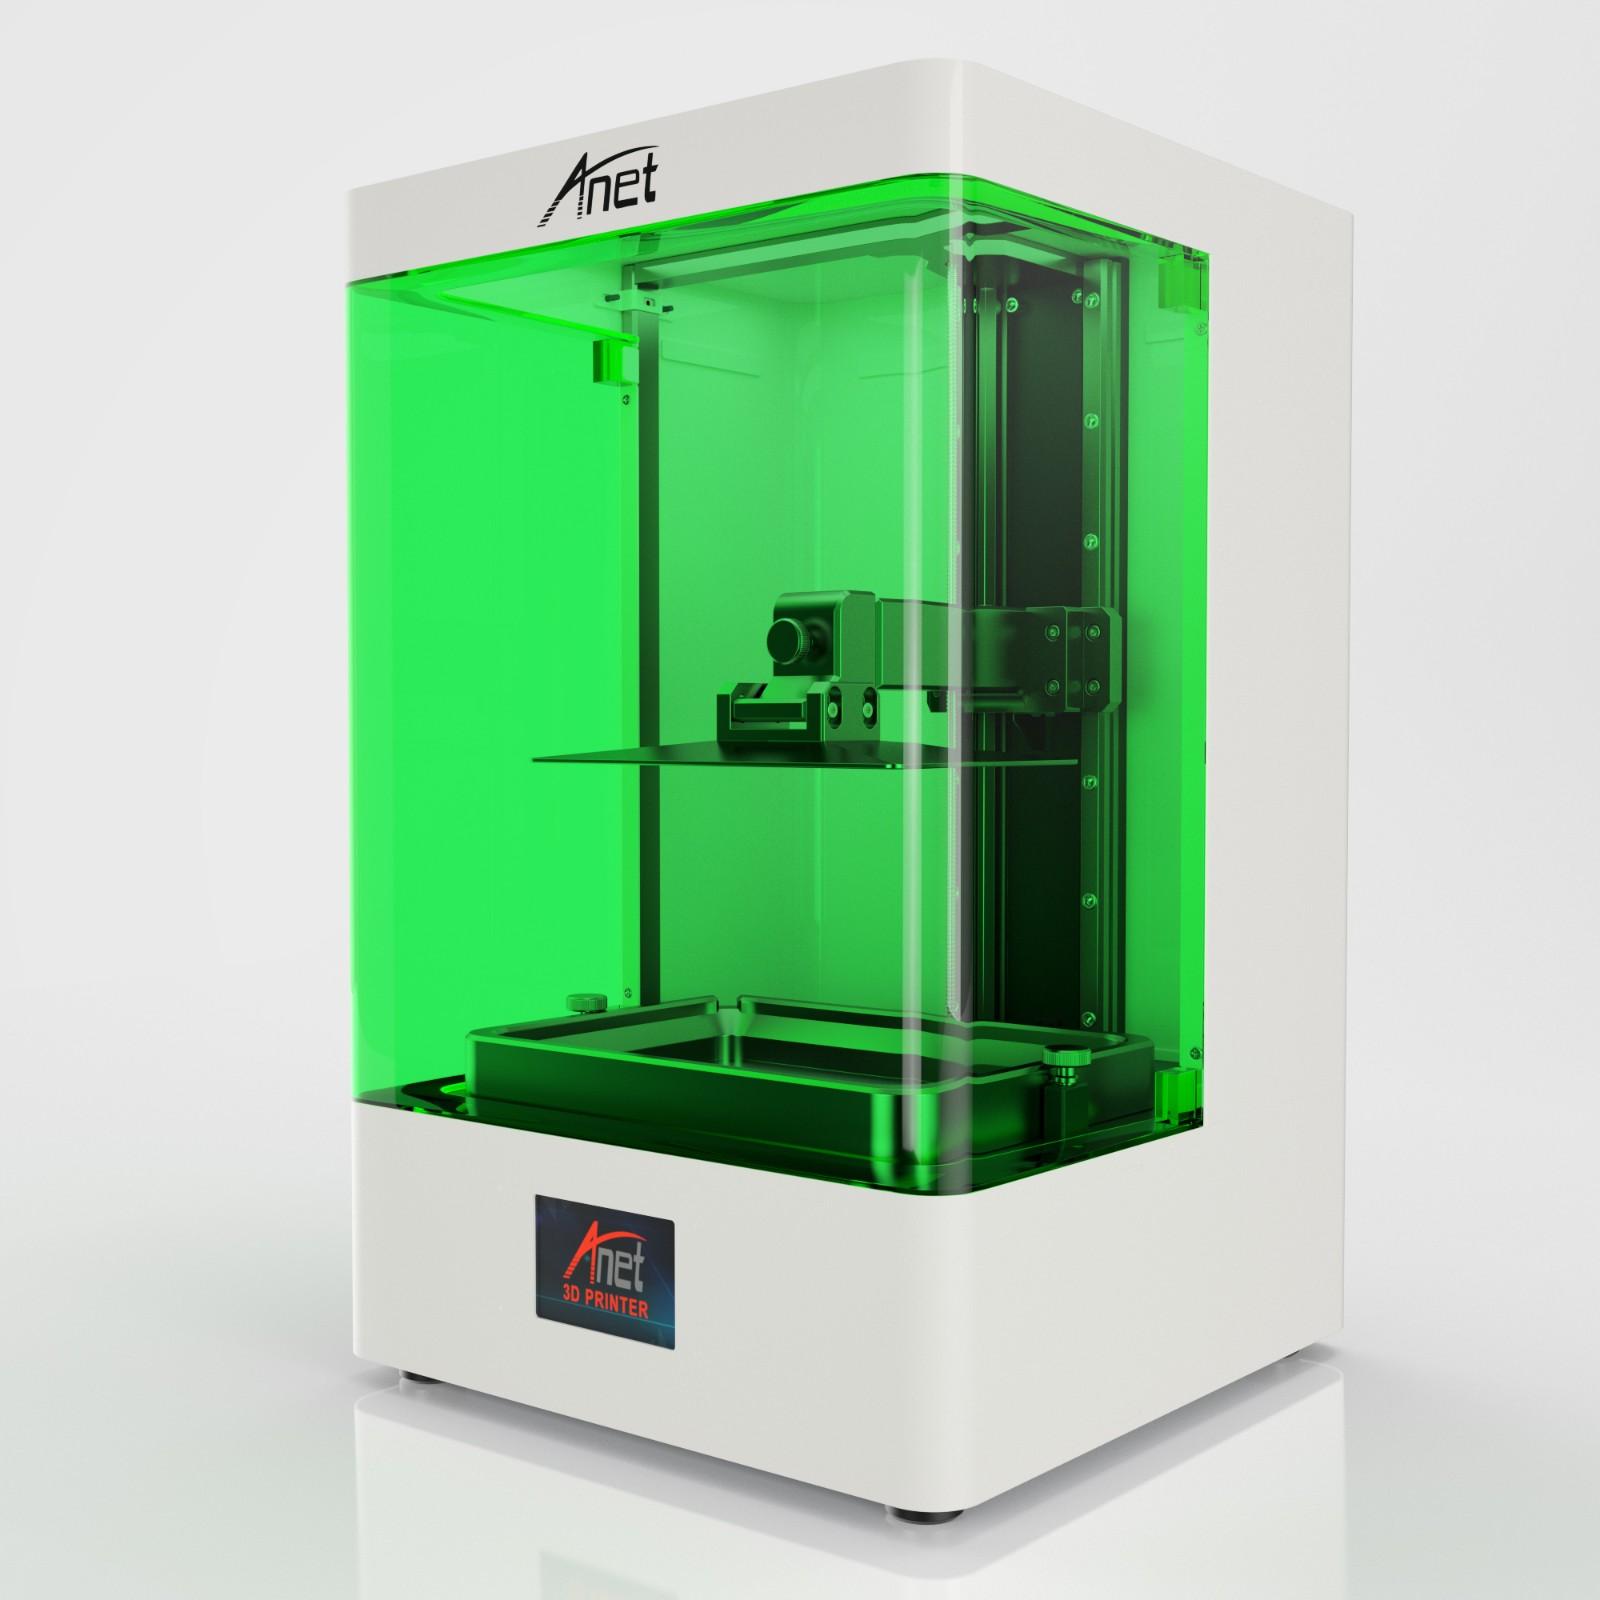 Shenzhen Anet Technology Co ,Ltd -- china 3D printer manufacturer